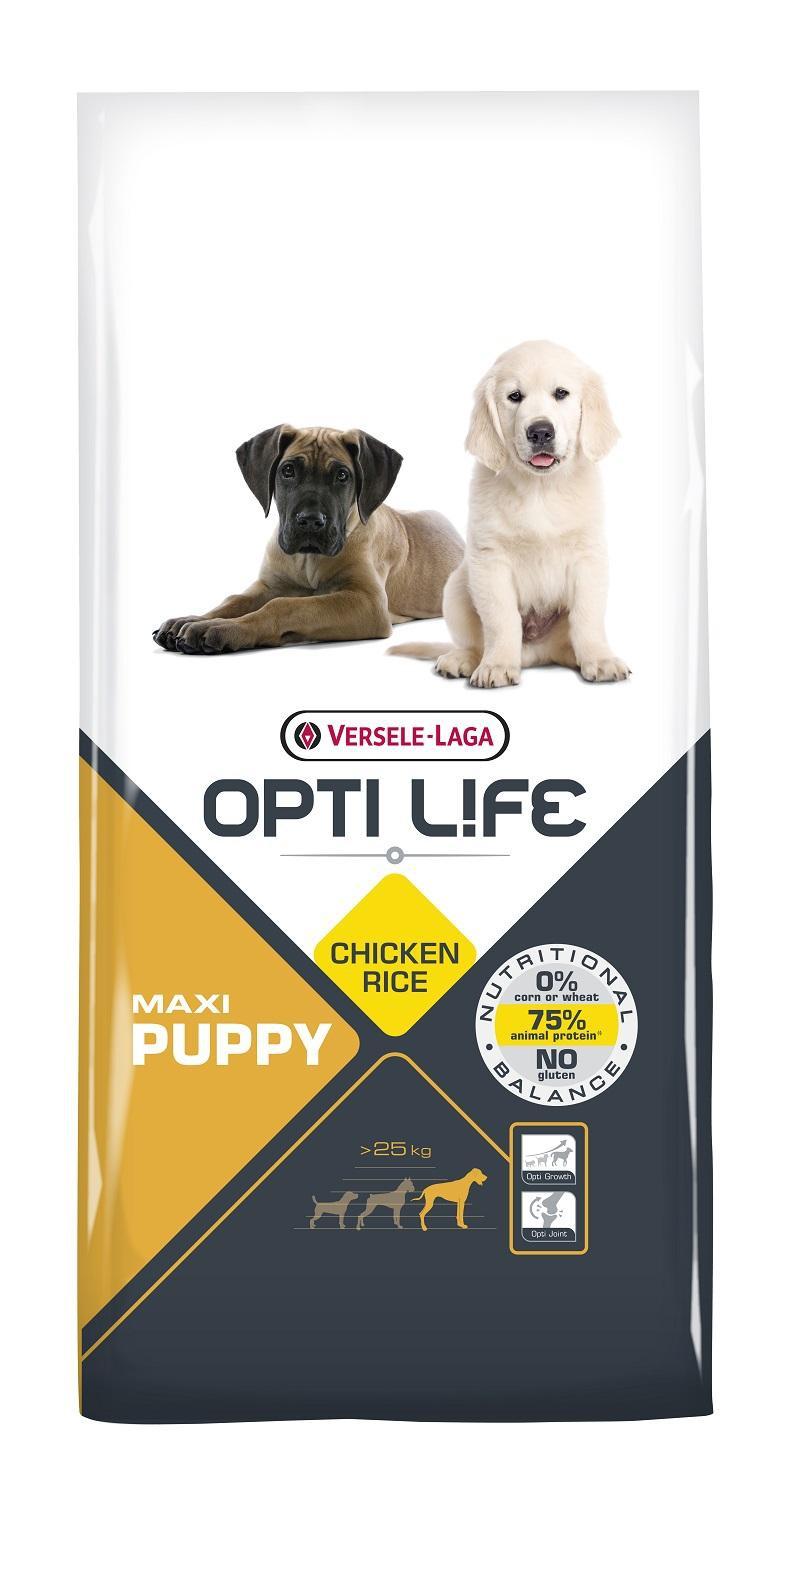 Versele-Laga Opti Life Puppy Maxi 12,5kg